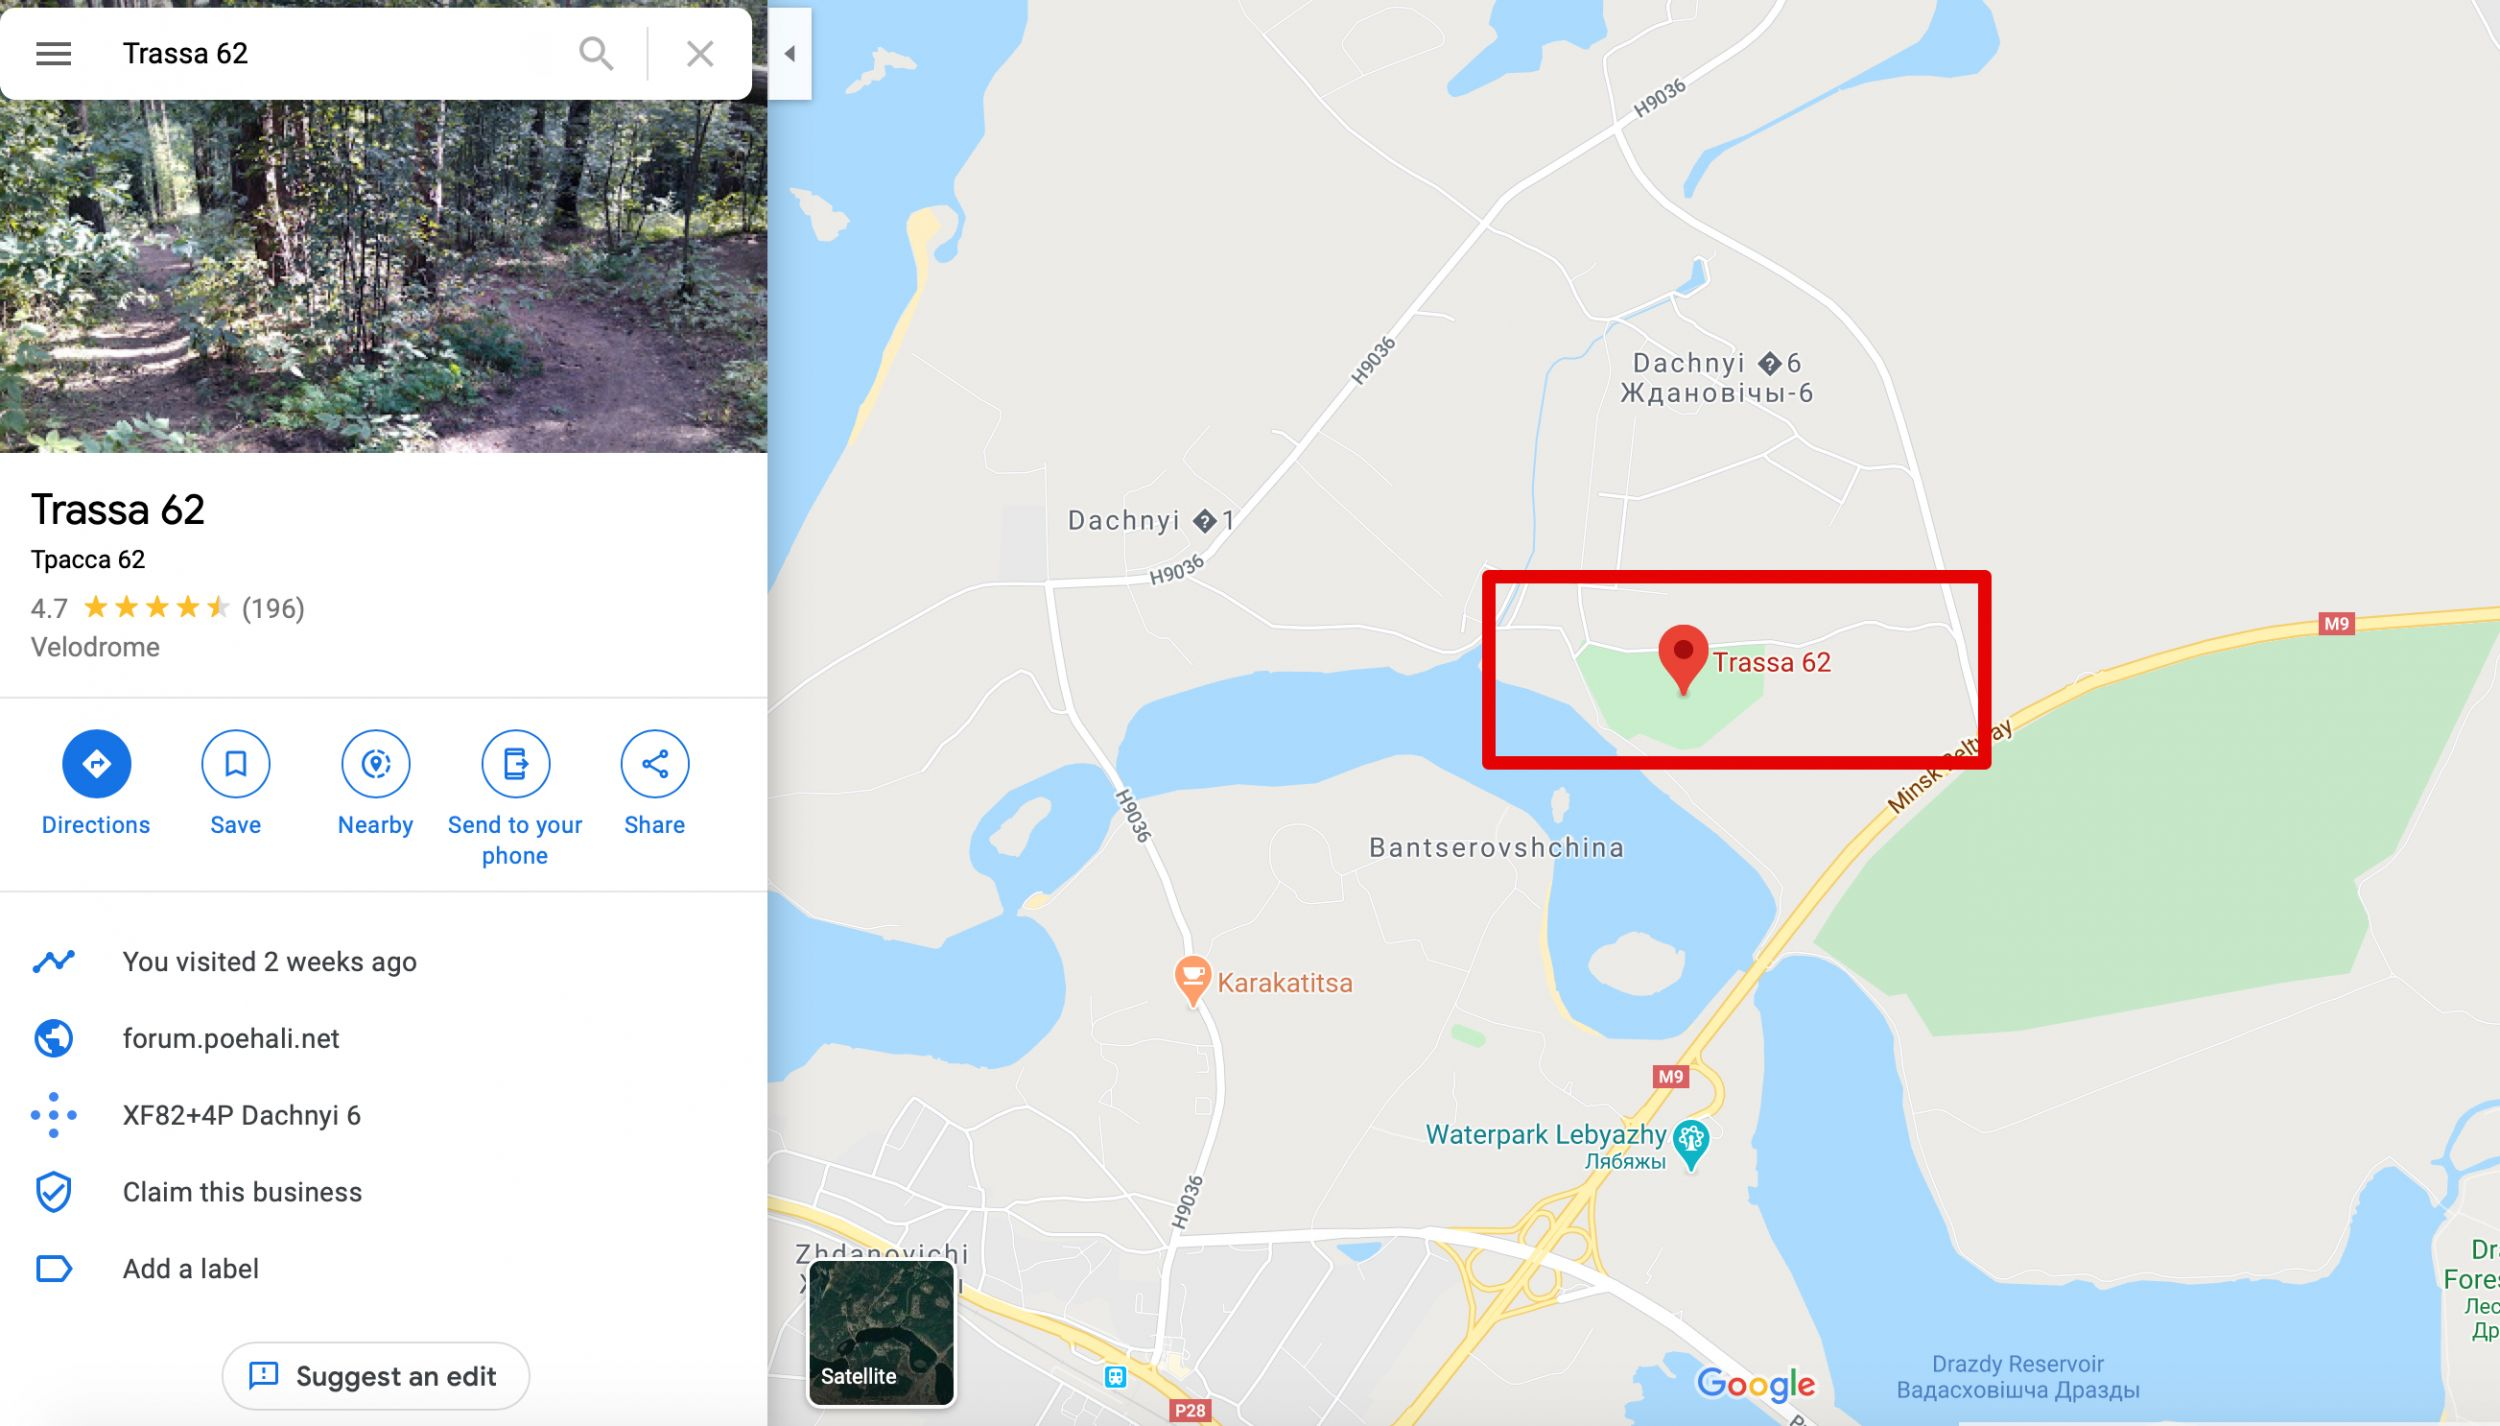 Trassa 62 - Google Maps 2020-07-10 21-21-26.jpg